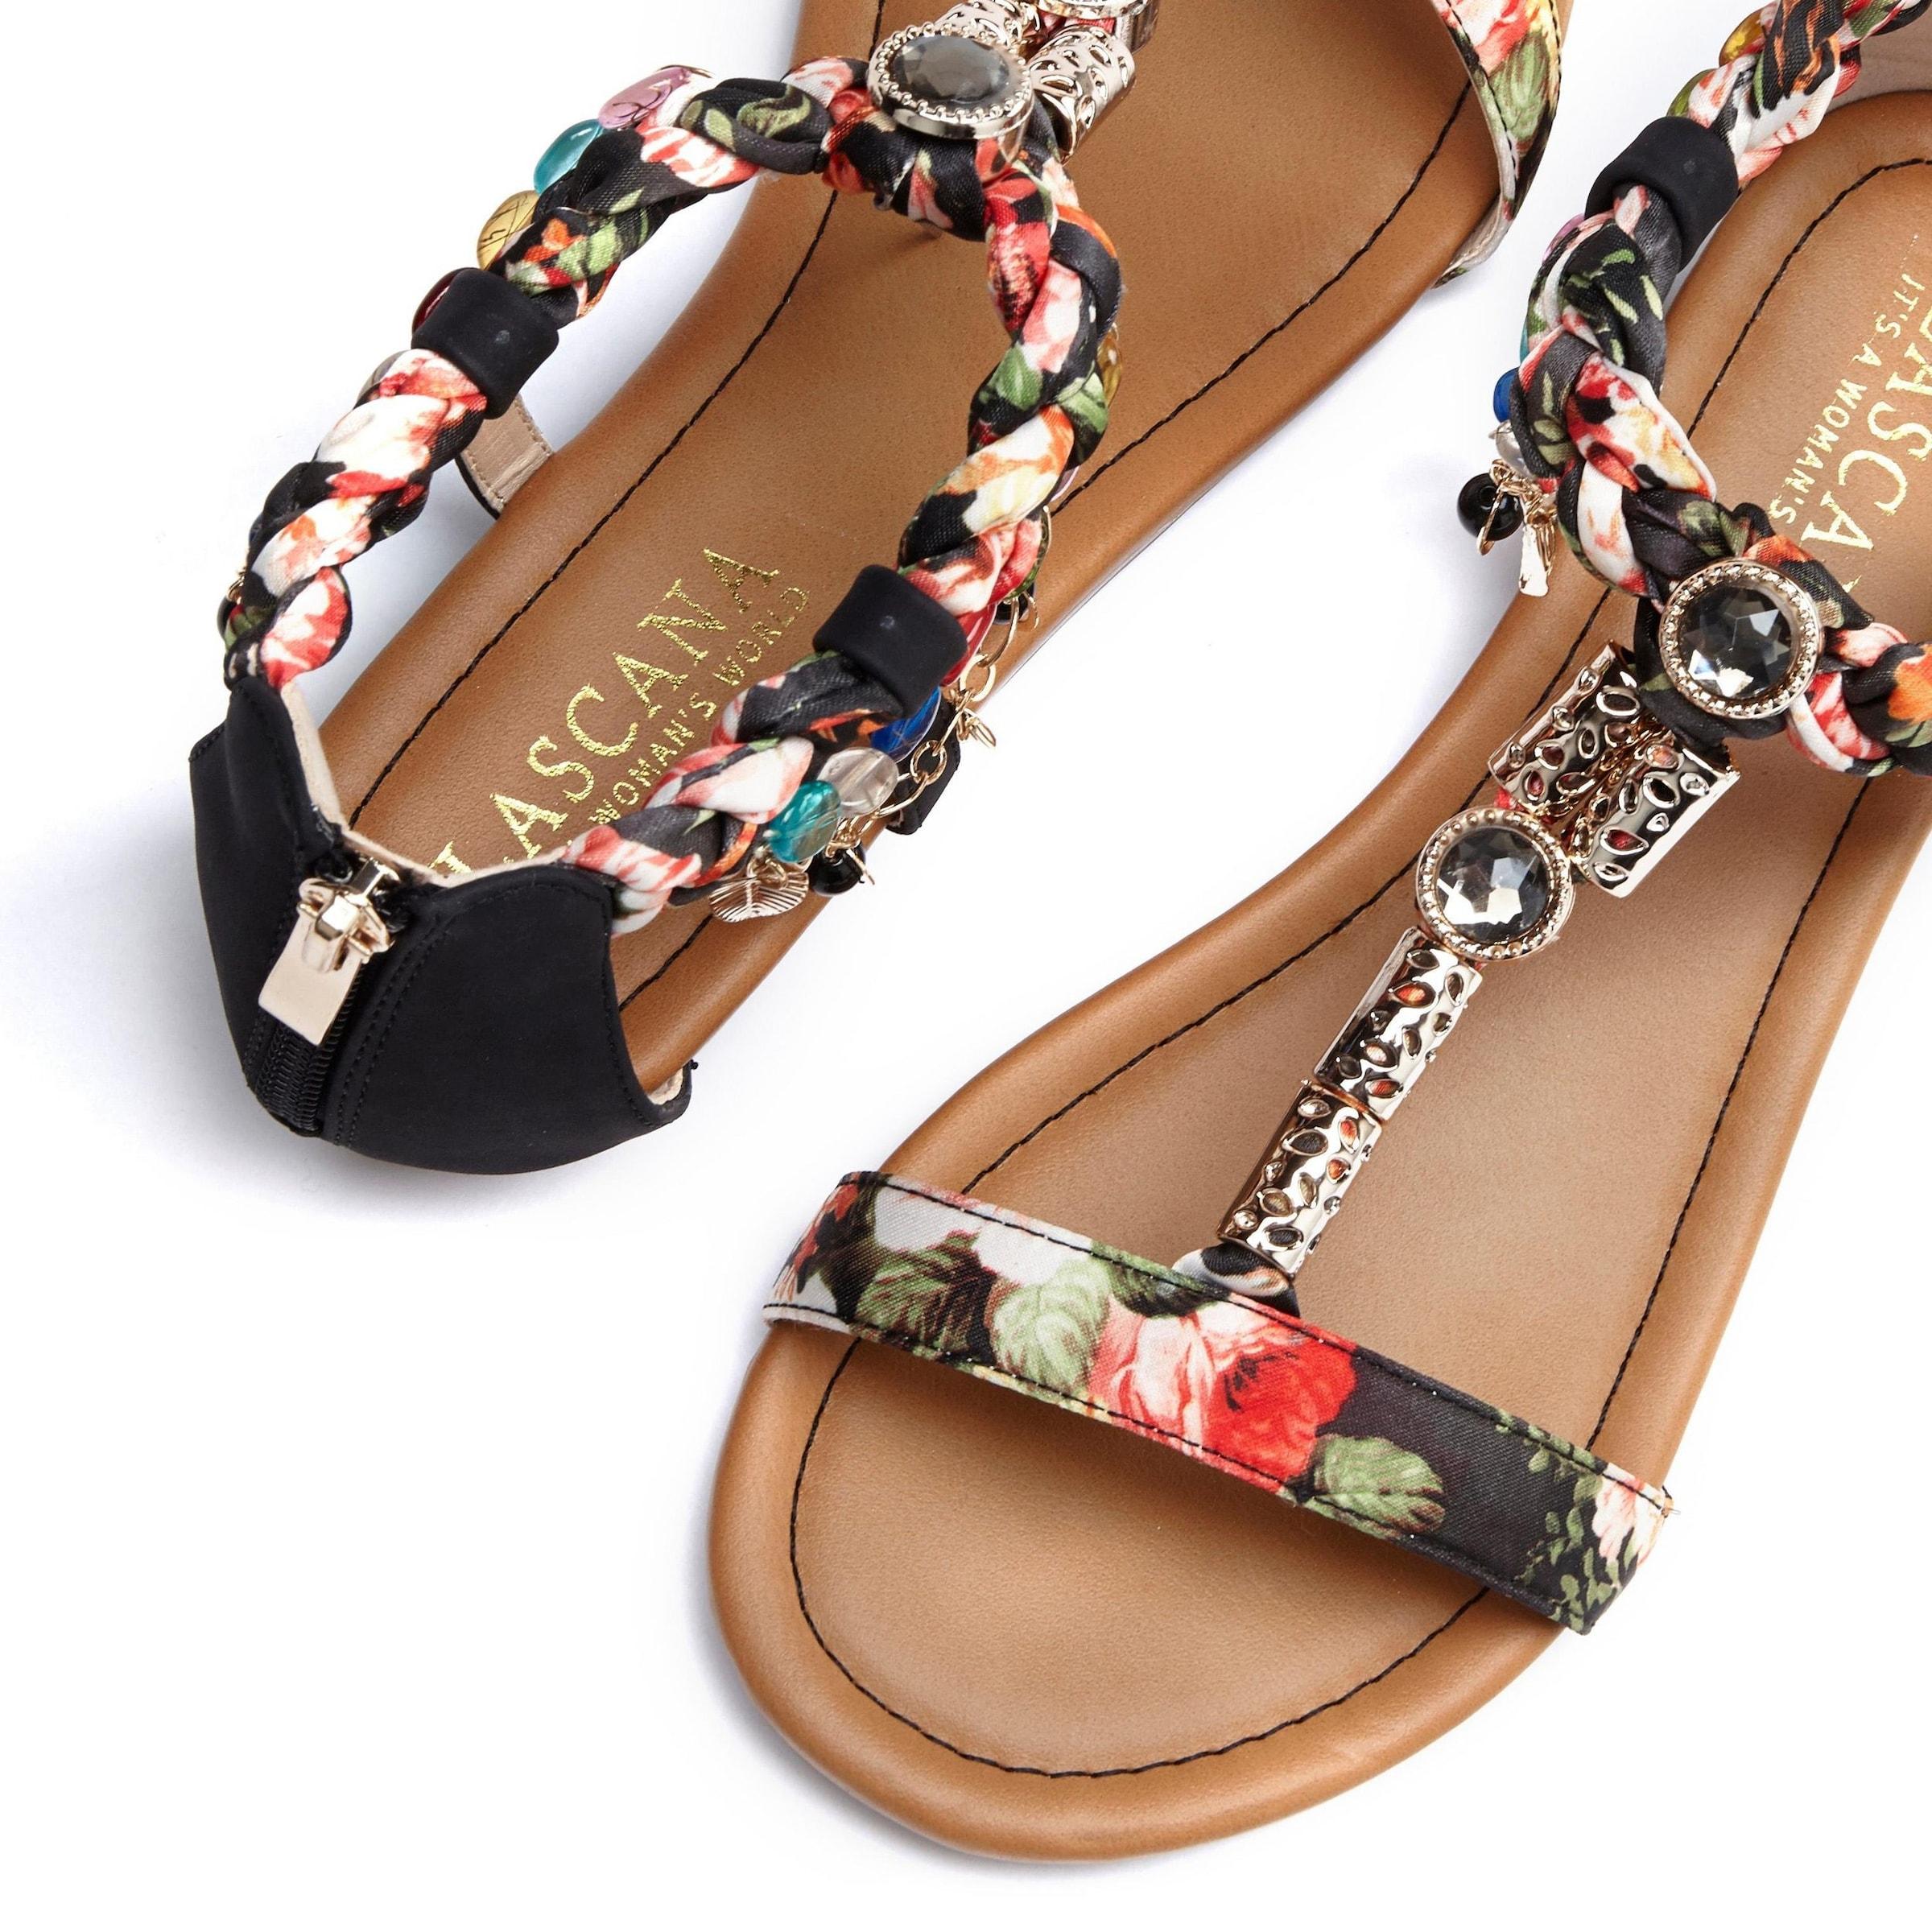 LASCANA Sandal i svart